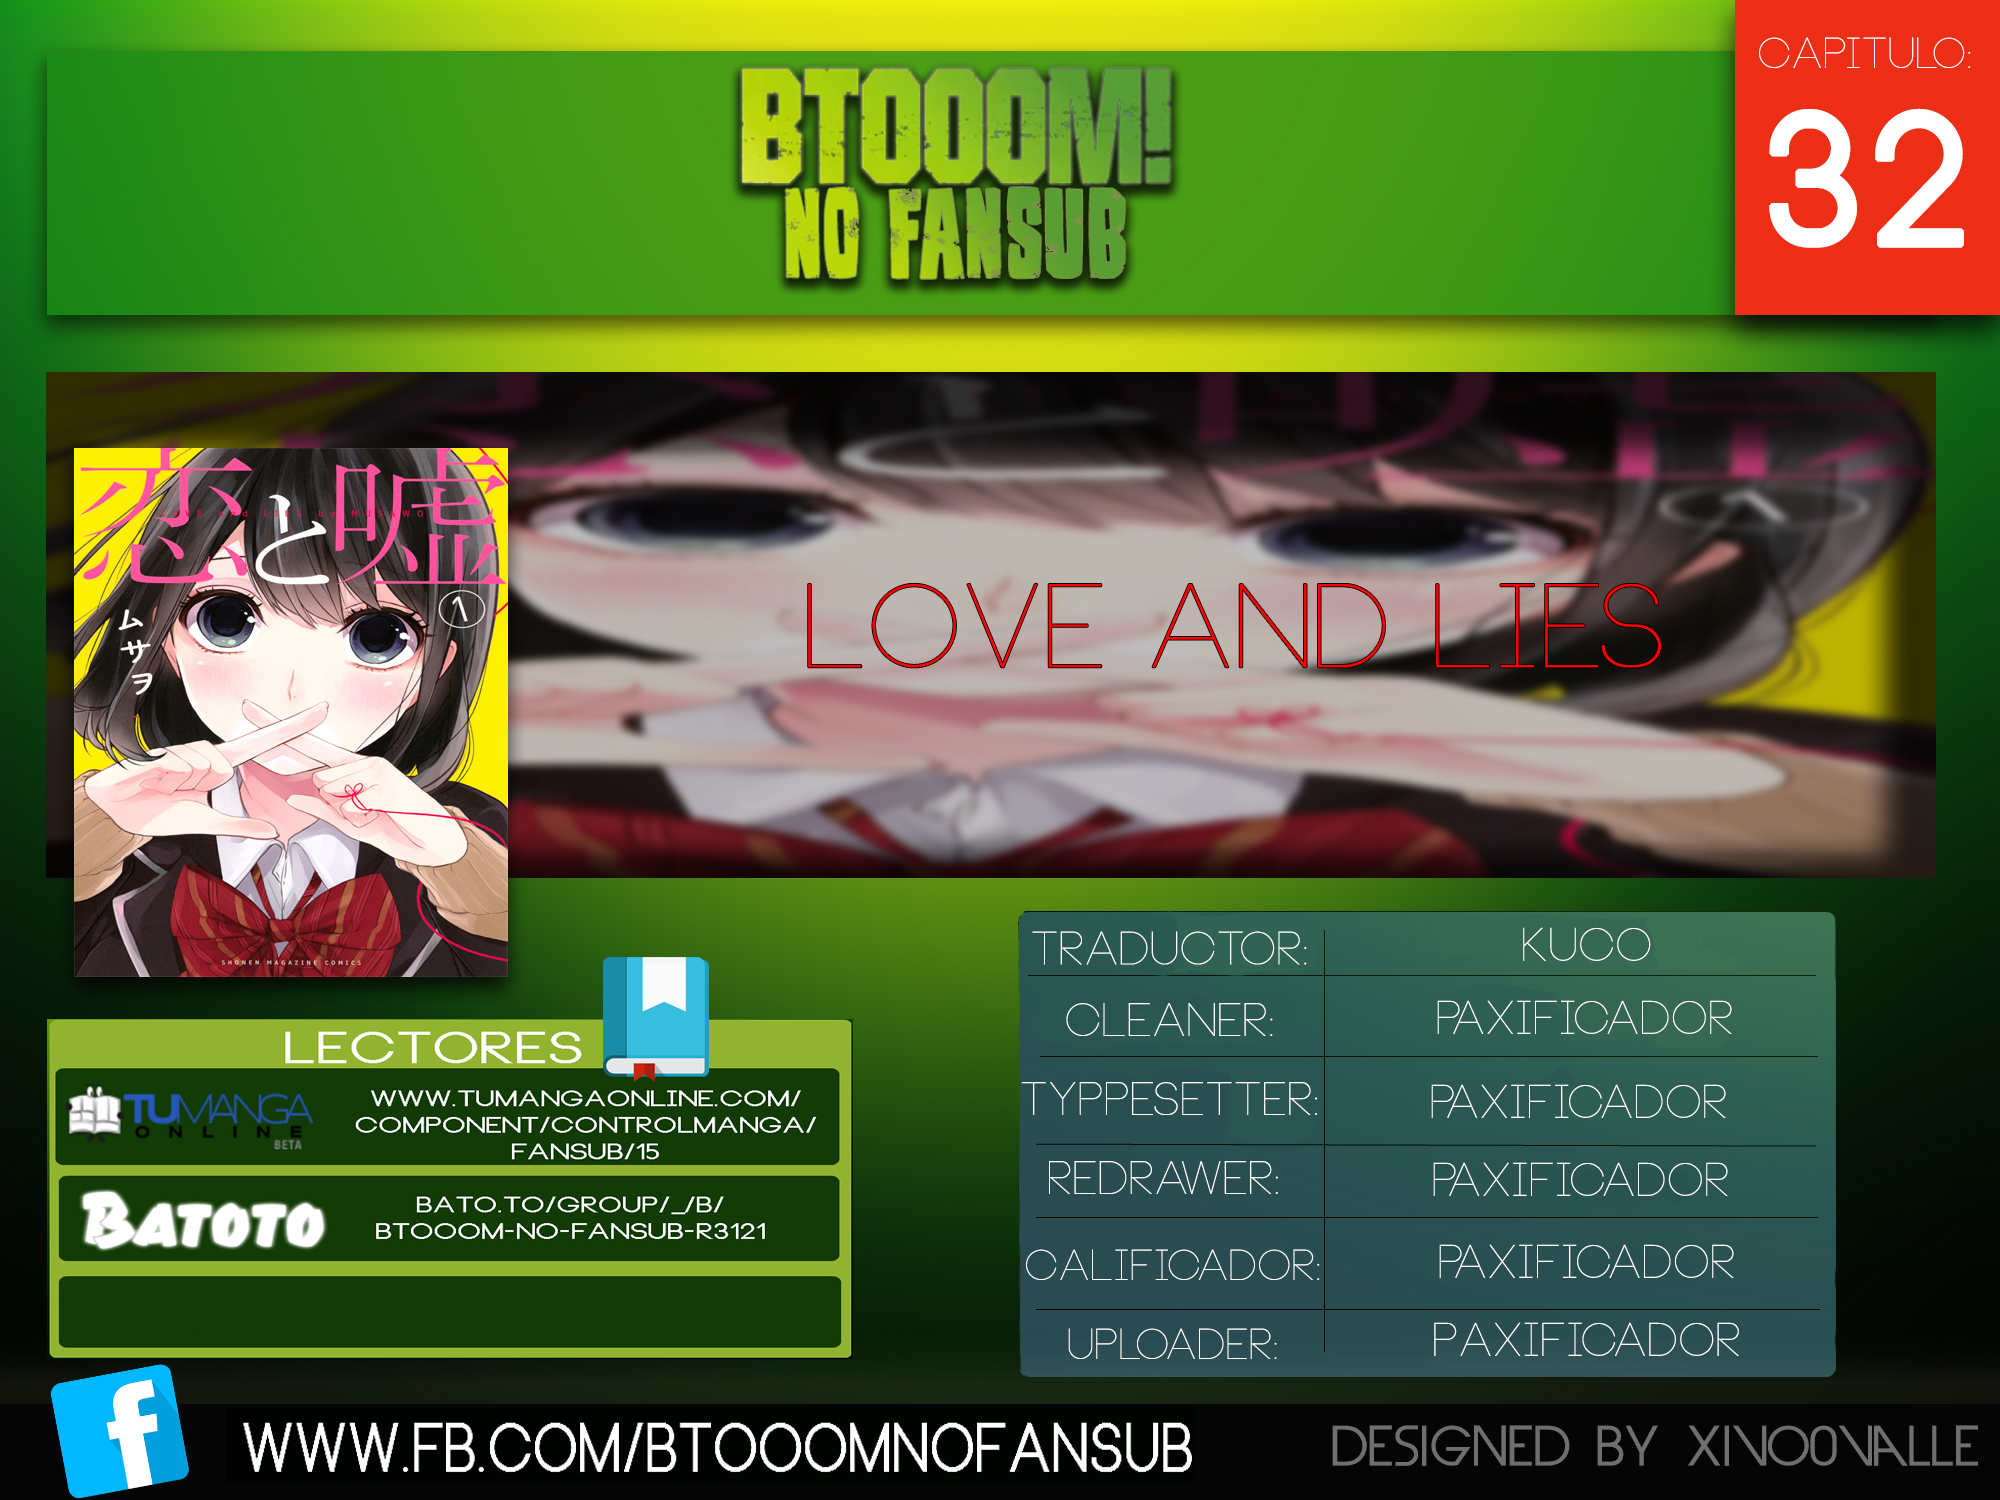 http://c5.ninemanga.com/es_manga/14/14734/361013/6cc3a4adfe1b28e1877ca651c5601123.jpg Page 1